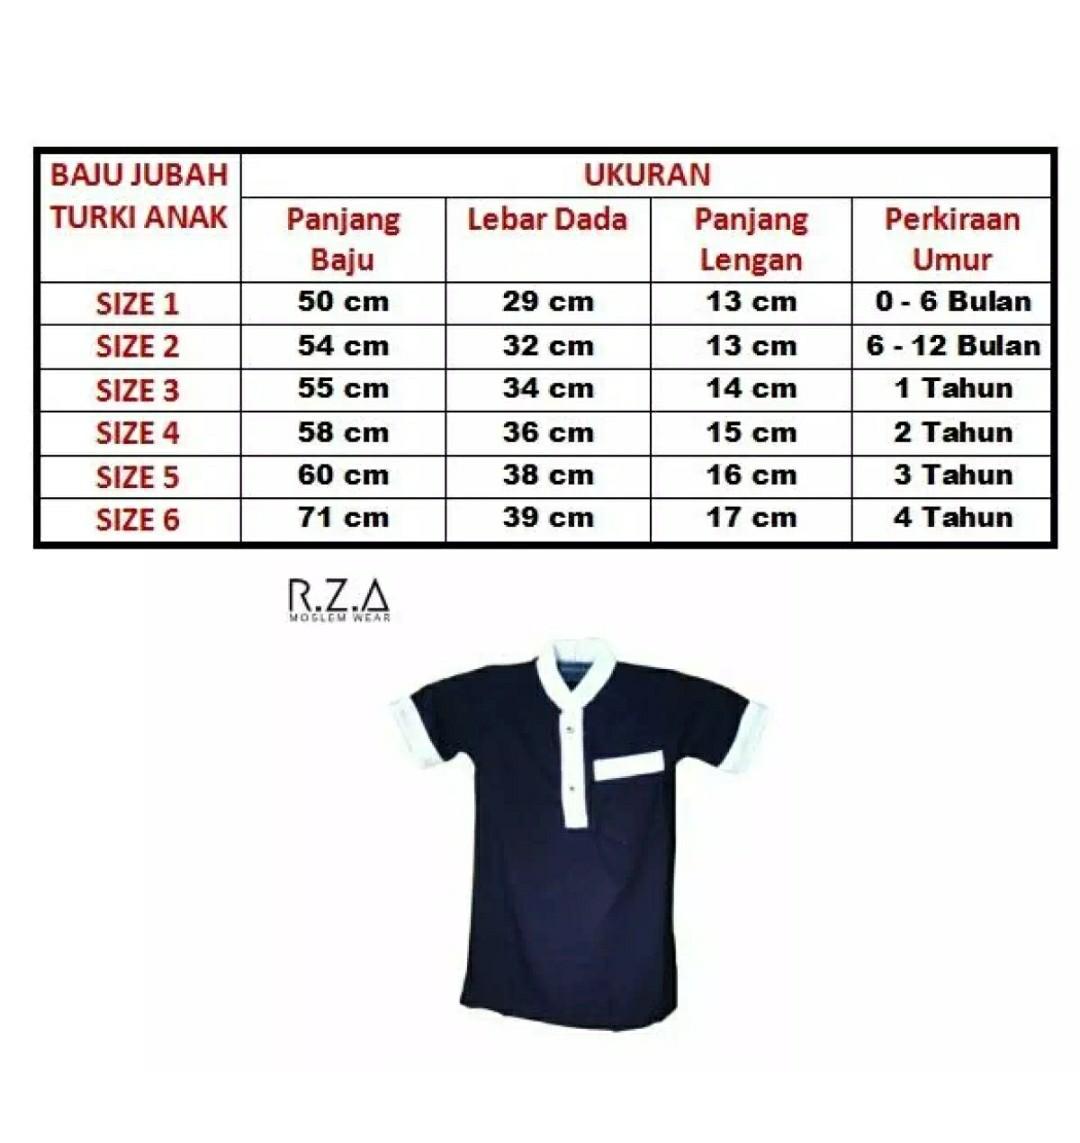 Gambar Produk Rinci RZA MW Gamis Jubah Anak Seri ( Tsaman ) Lengan Pendek Warna Merah Maroon Marun Motif kotak Baju Koko Bayi Dan Balita Model TURKI Polos ...